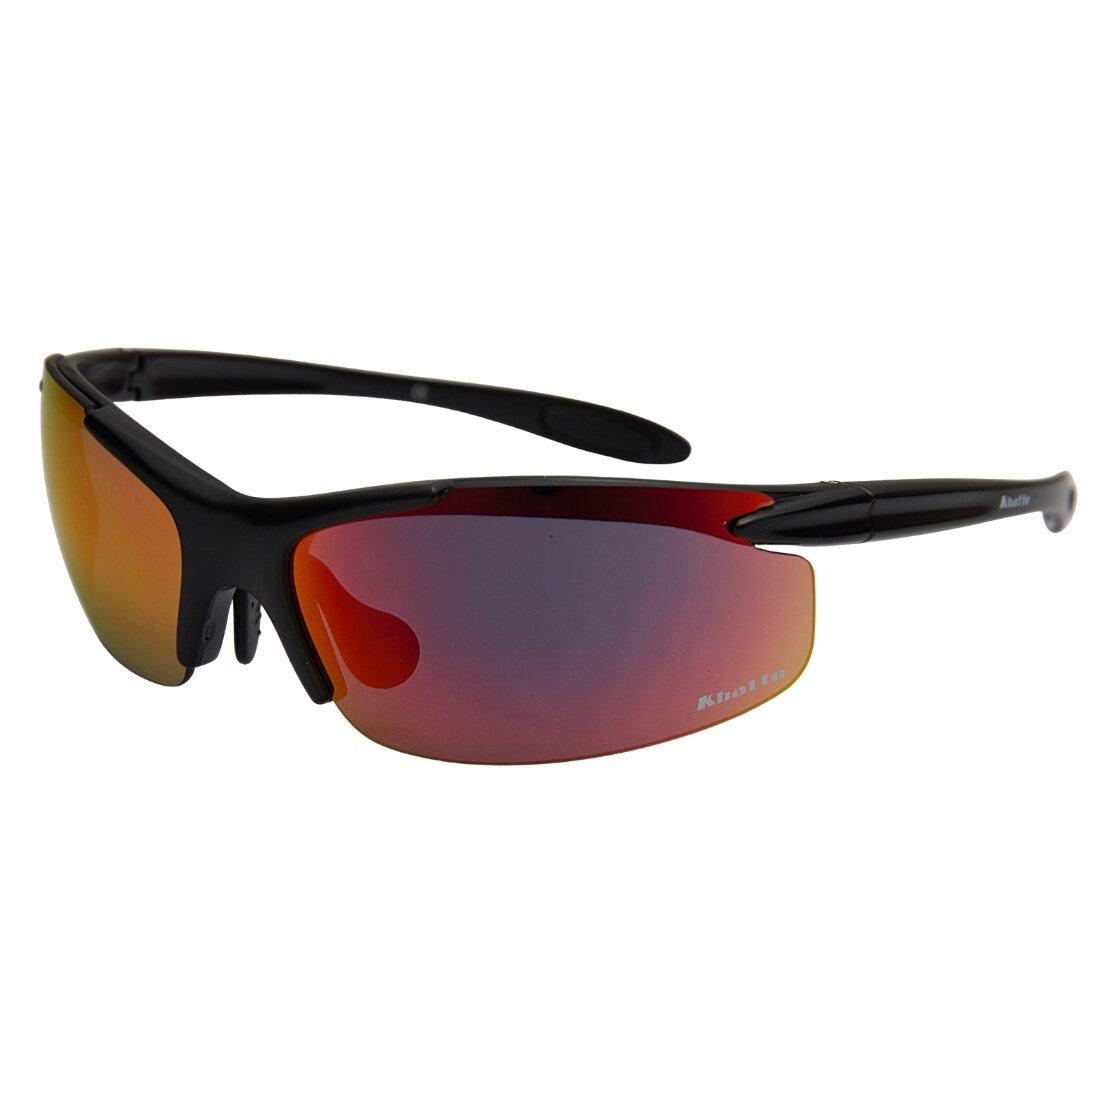 OUTLET - Óculos de Sol Khatto Esportivo Trail TR90 Frame